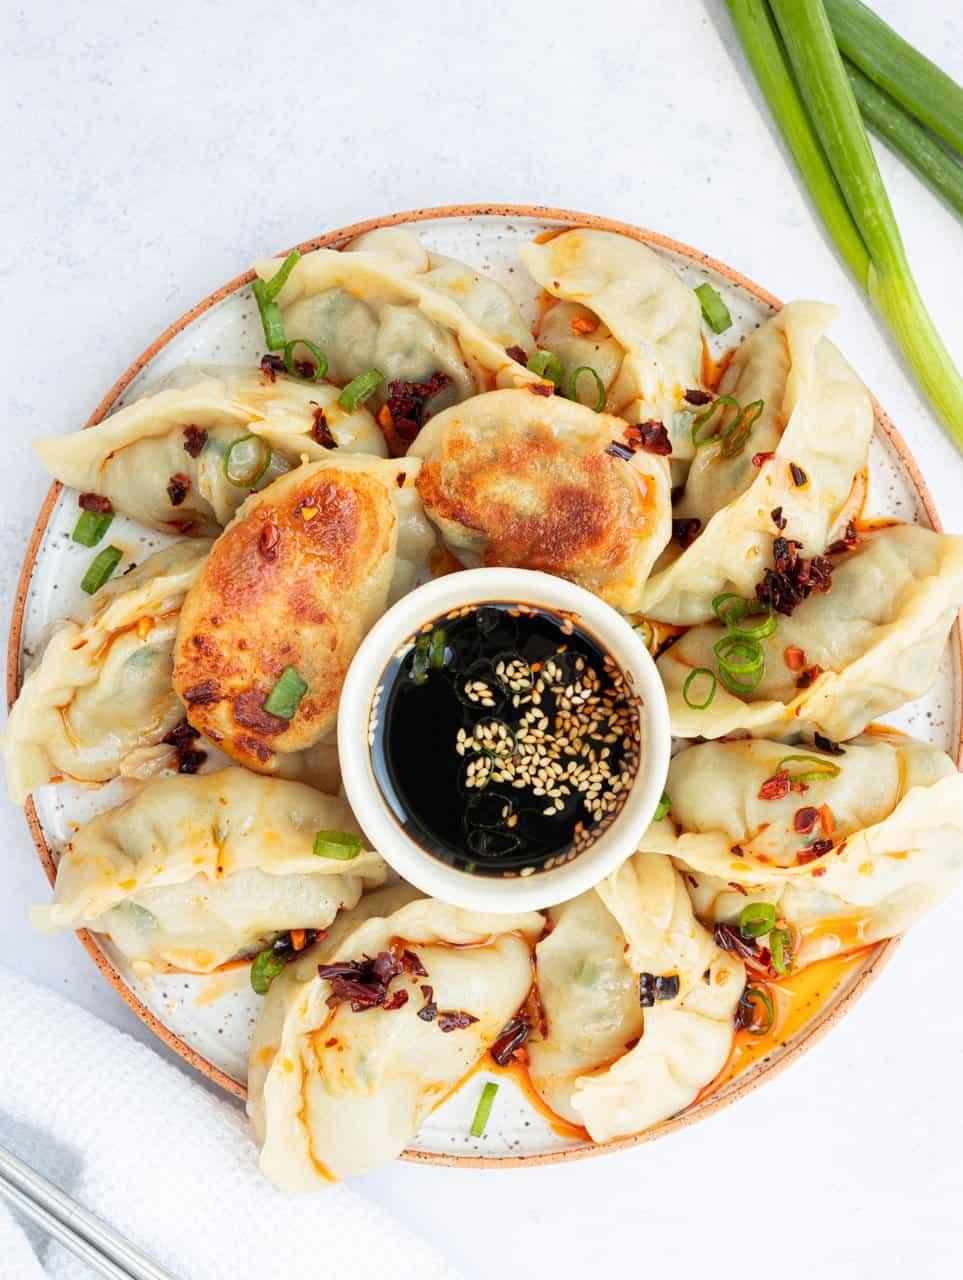 Chinese Pork Chive Dumplings